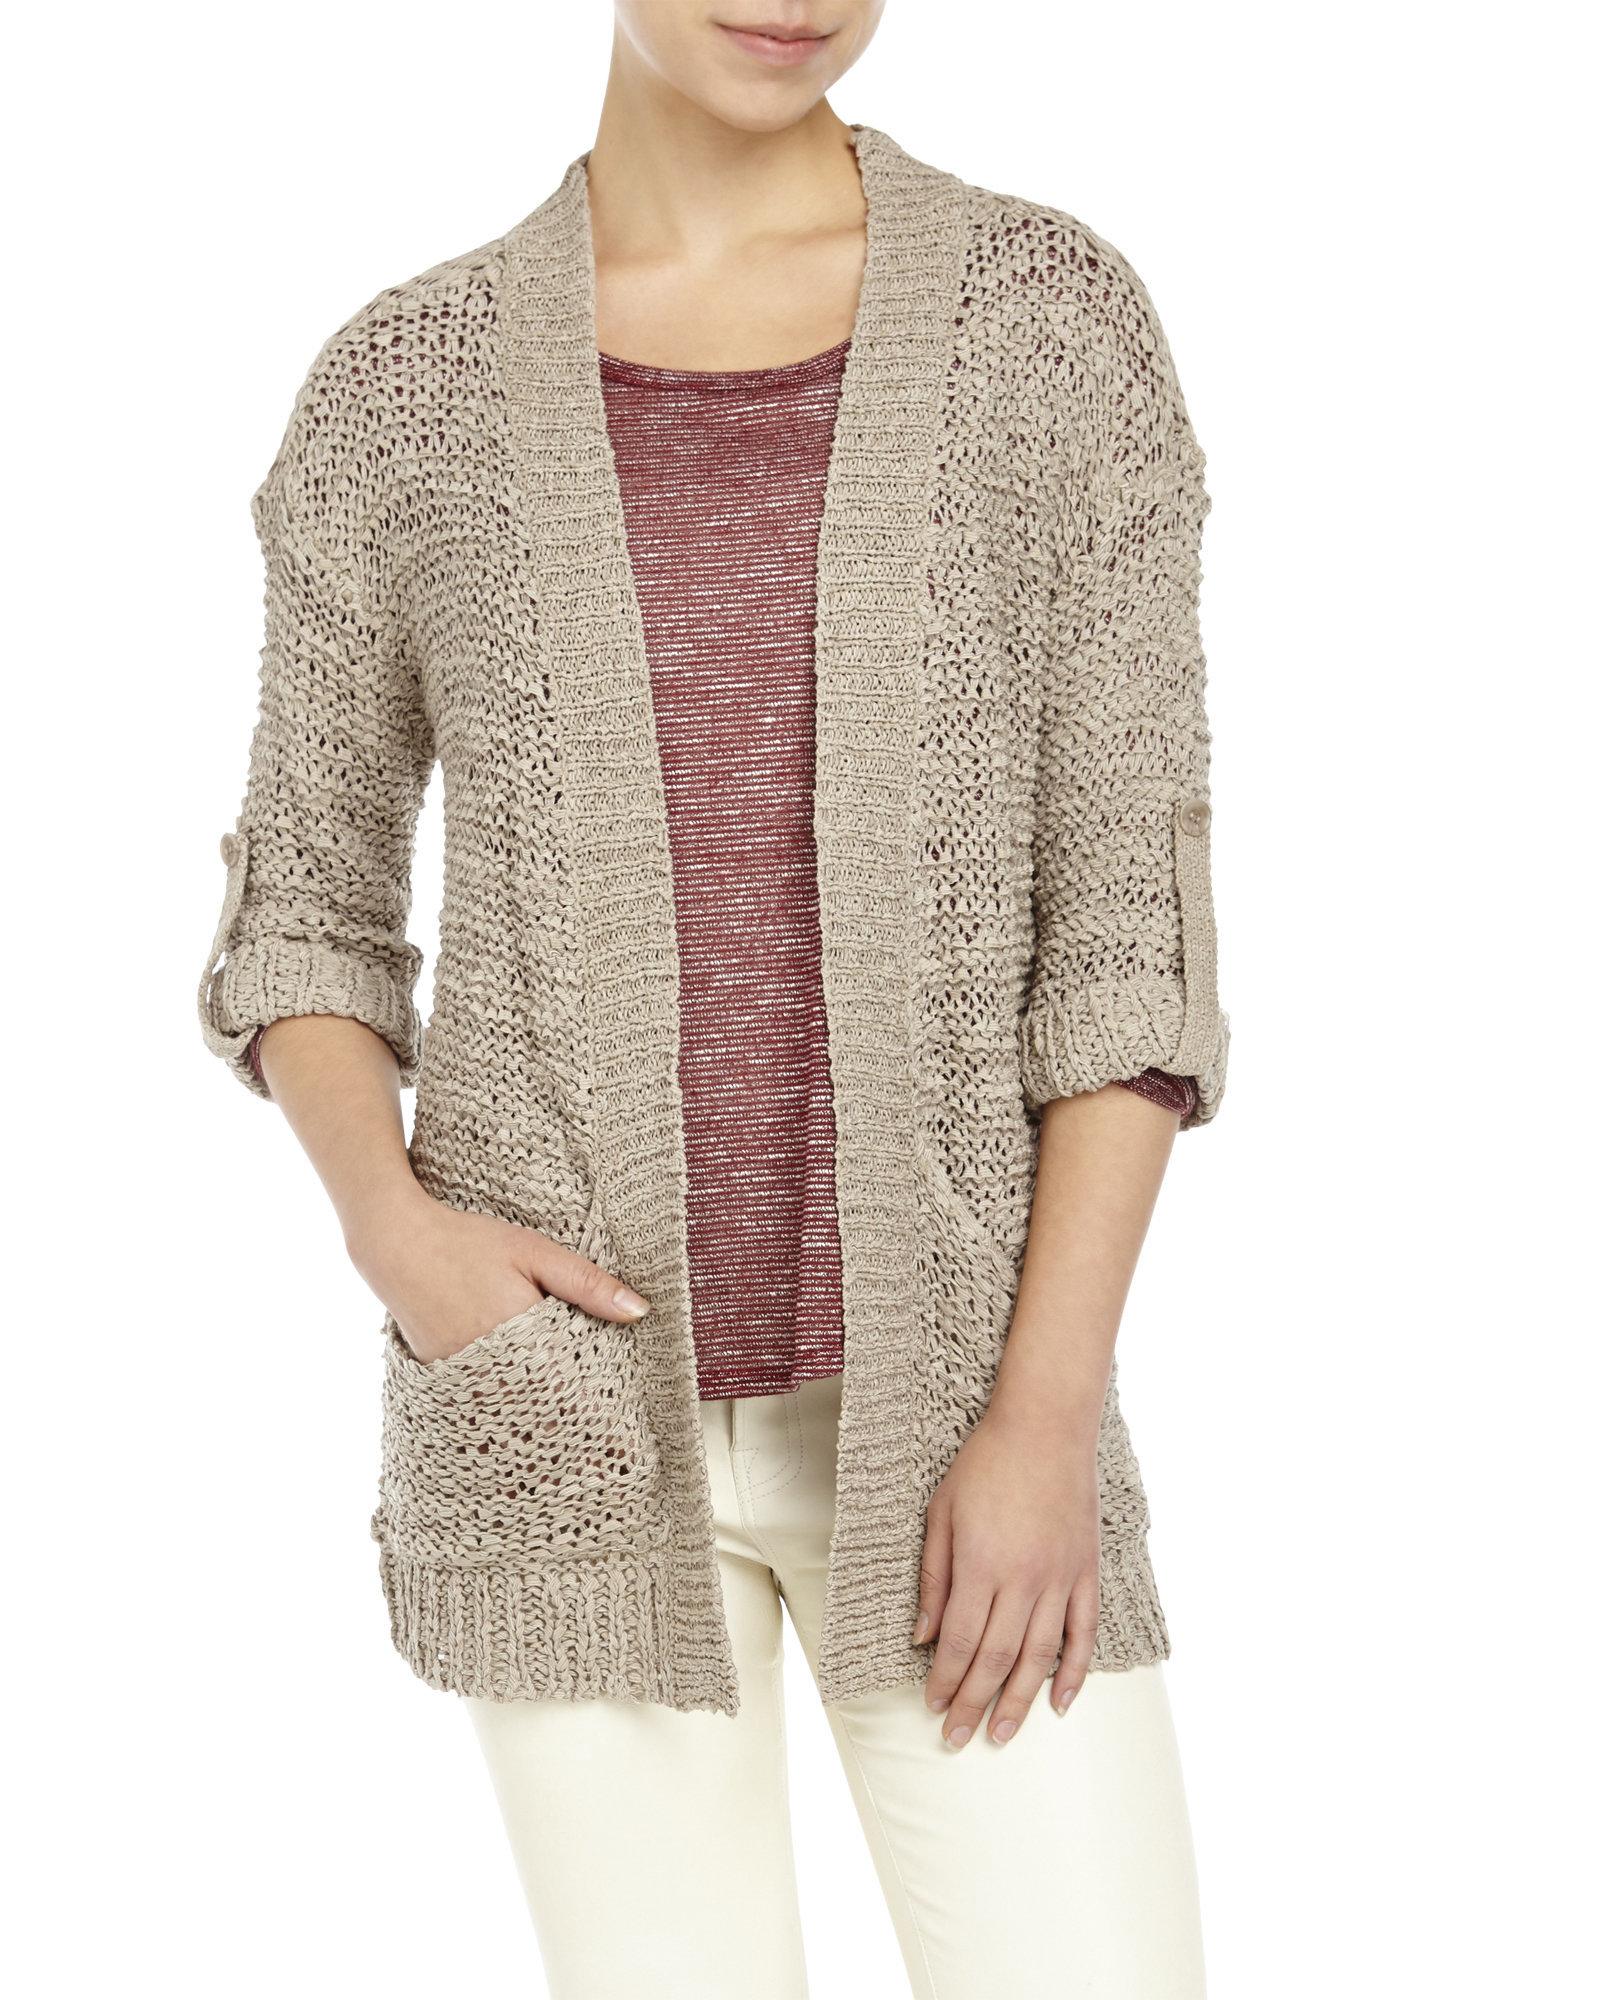 Knitting Pattern Open Front Cardigan : Coupe collection Open Front Tab Sleeve Knit Cardigan in Brown (Mocha) - Save ...